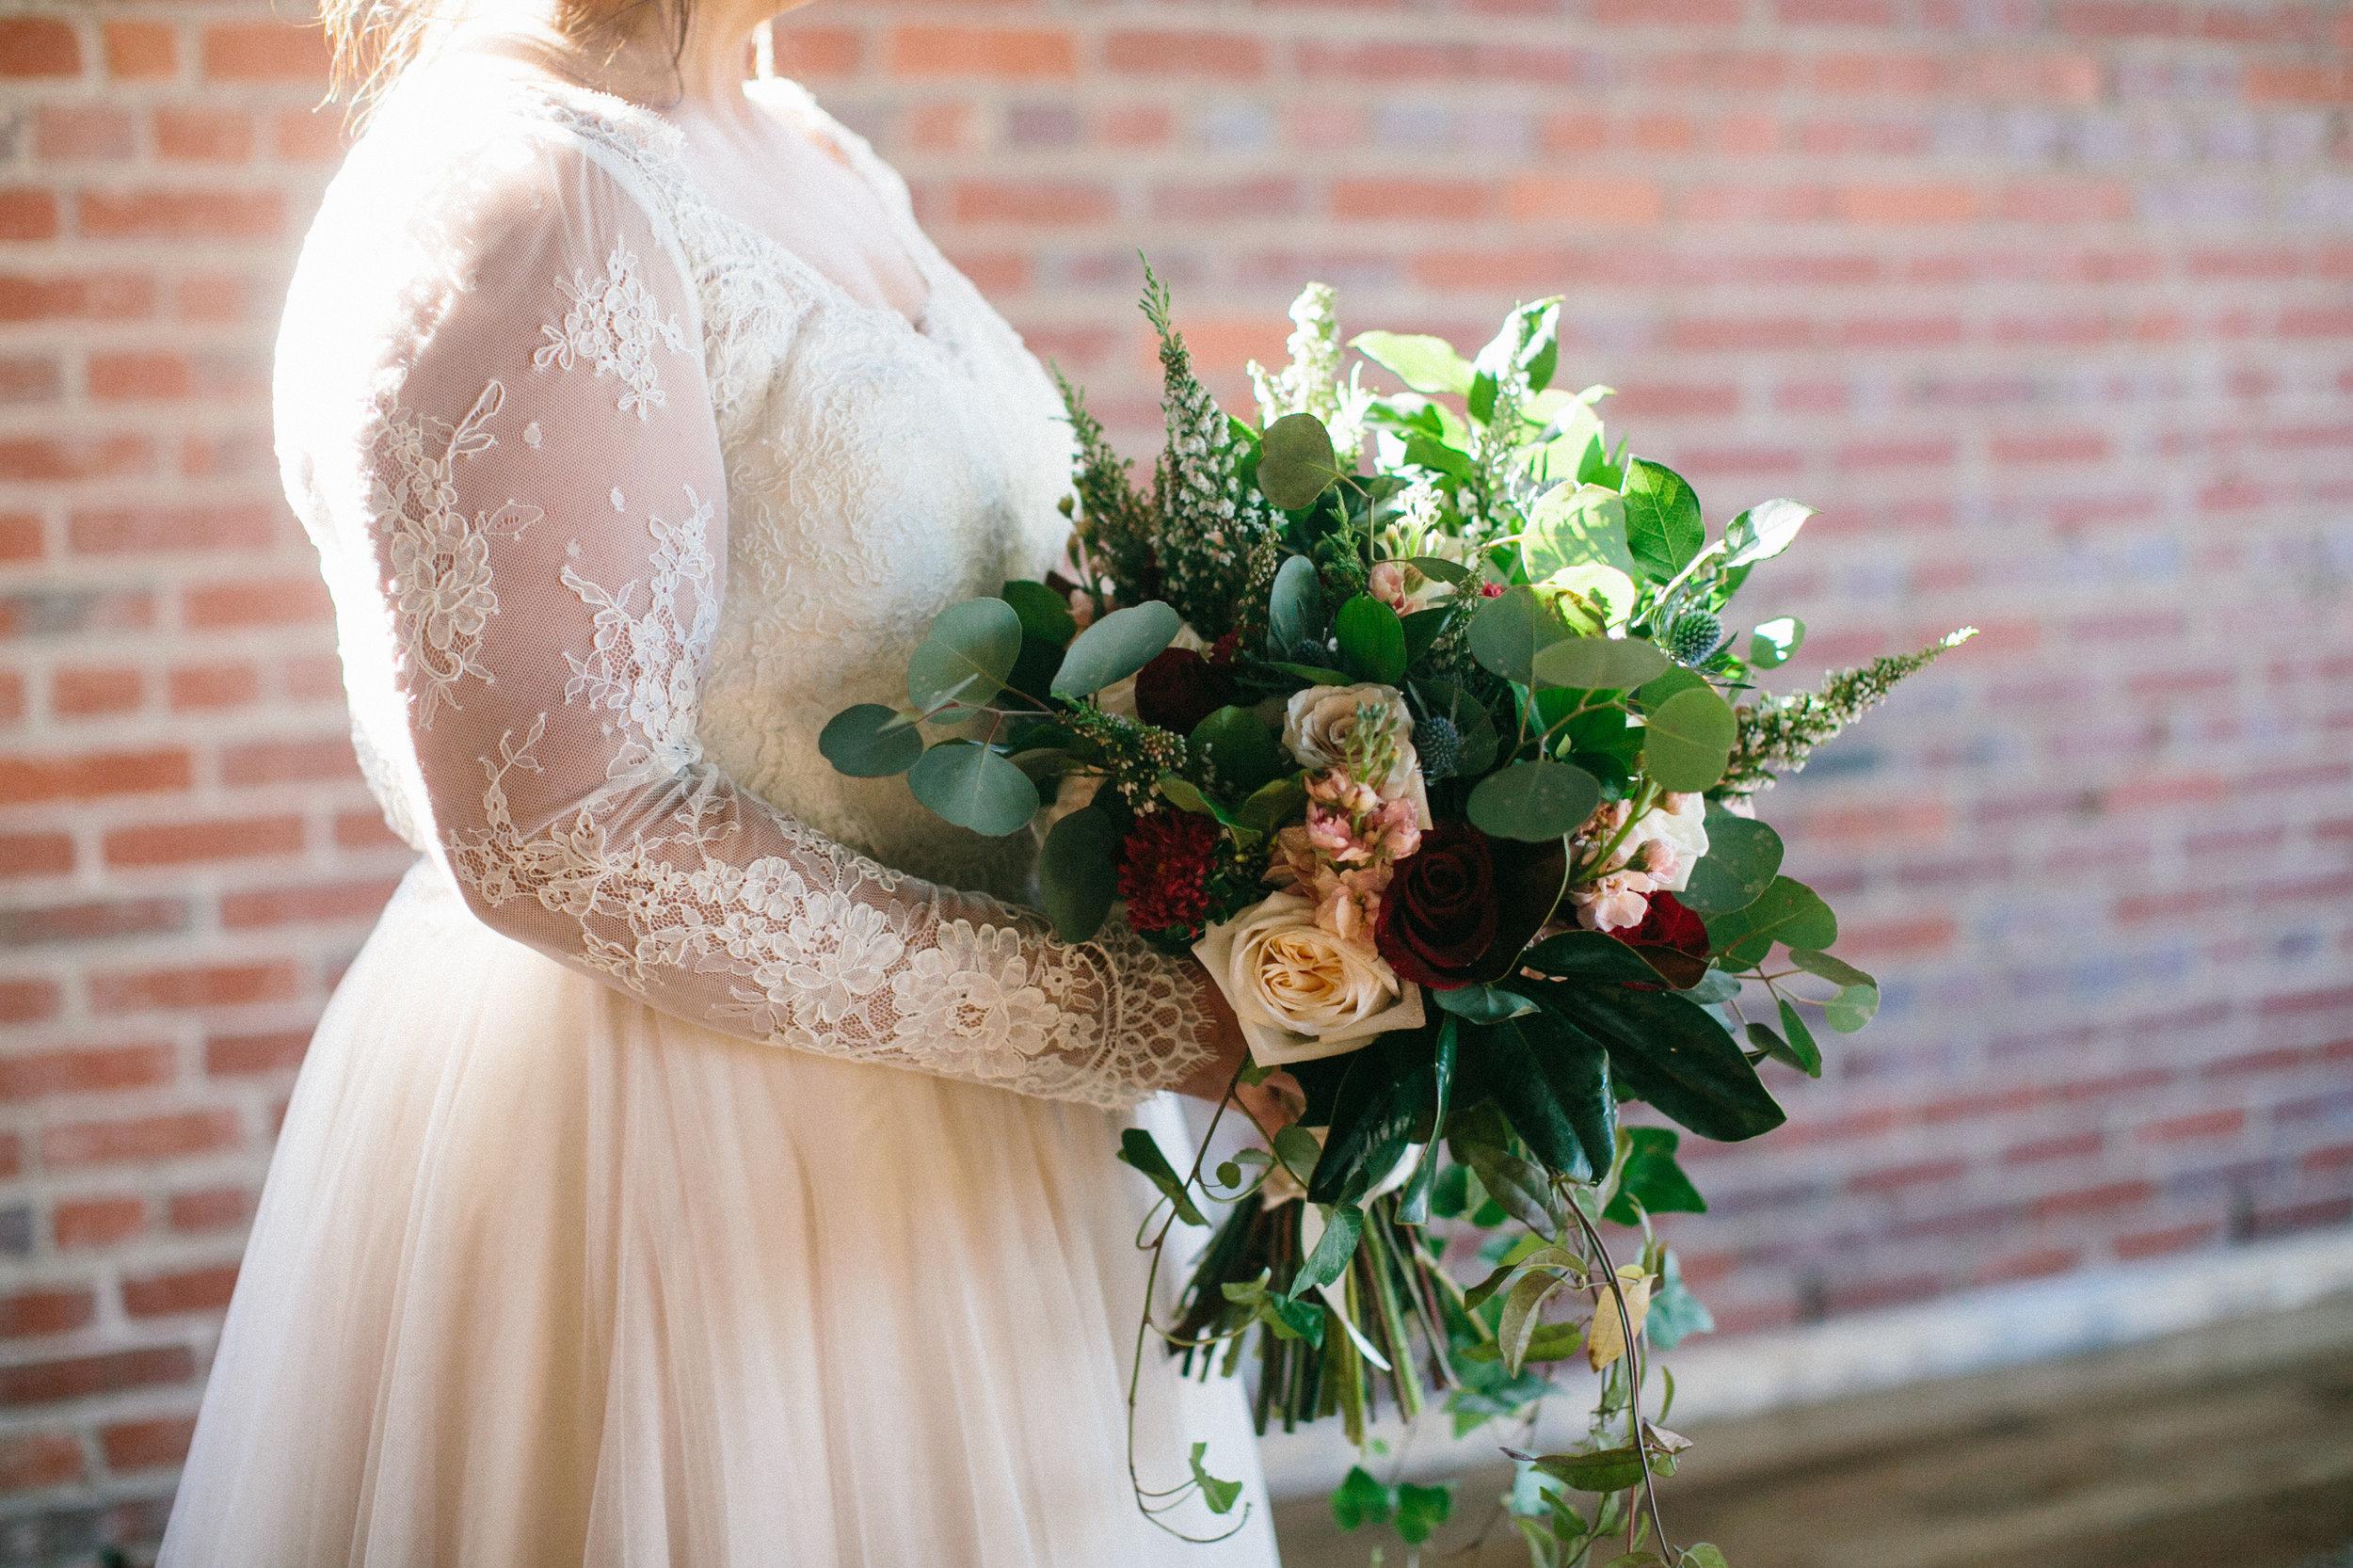 Lauren_Jeremy_Standard_Wedding_Knoxville_Abigail_Malone_Photography_FIlm-127.jpg